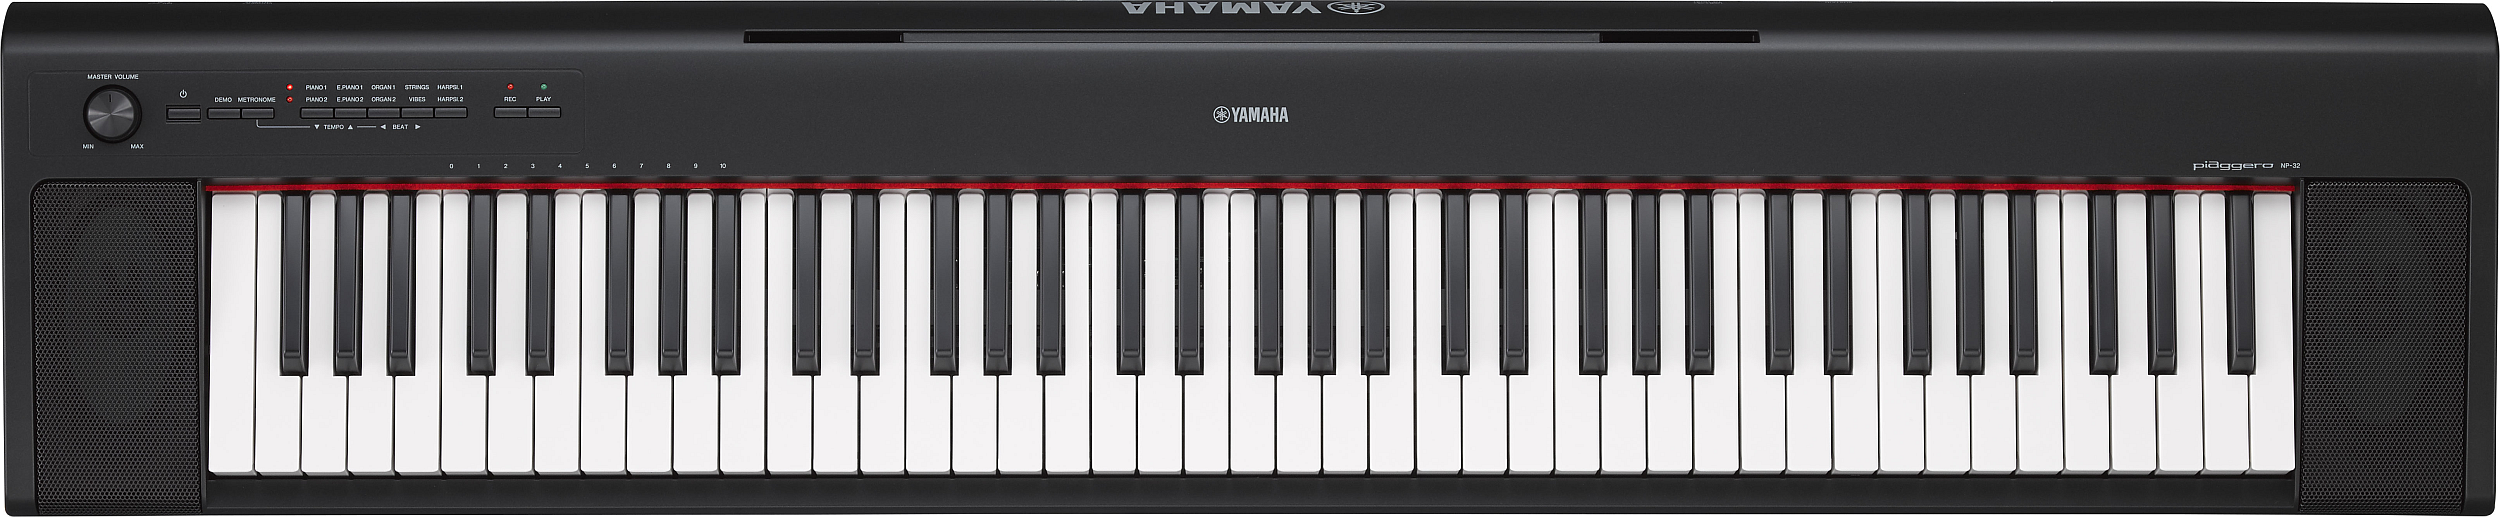 Yamaha NP-32B Piaggero digitális színpadi zongora